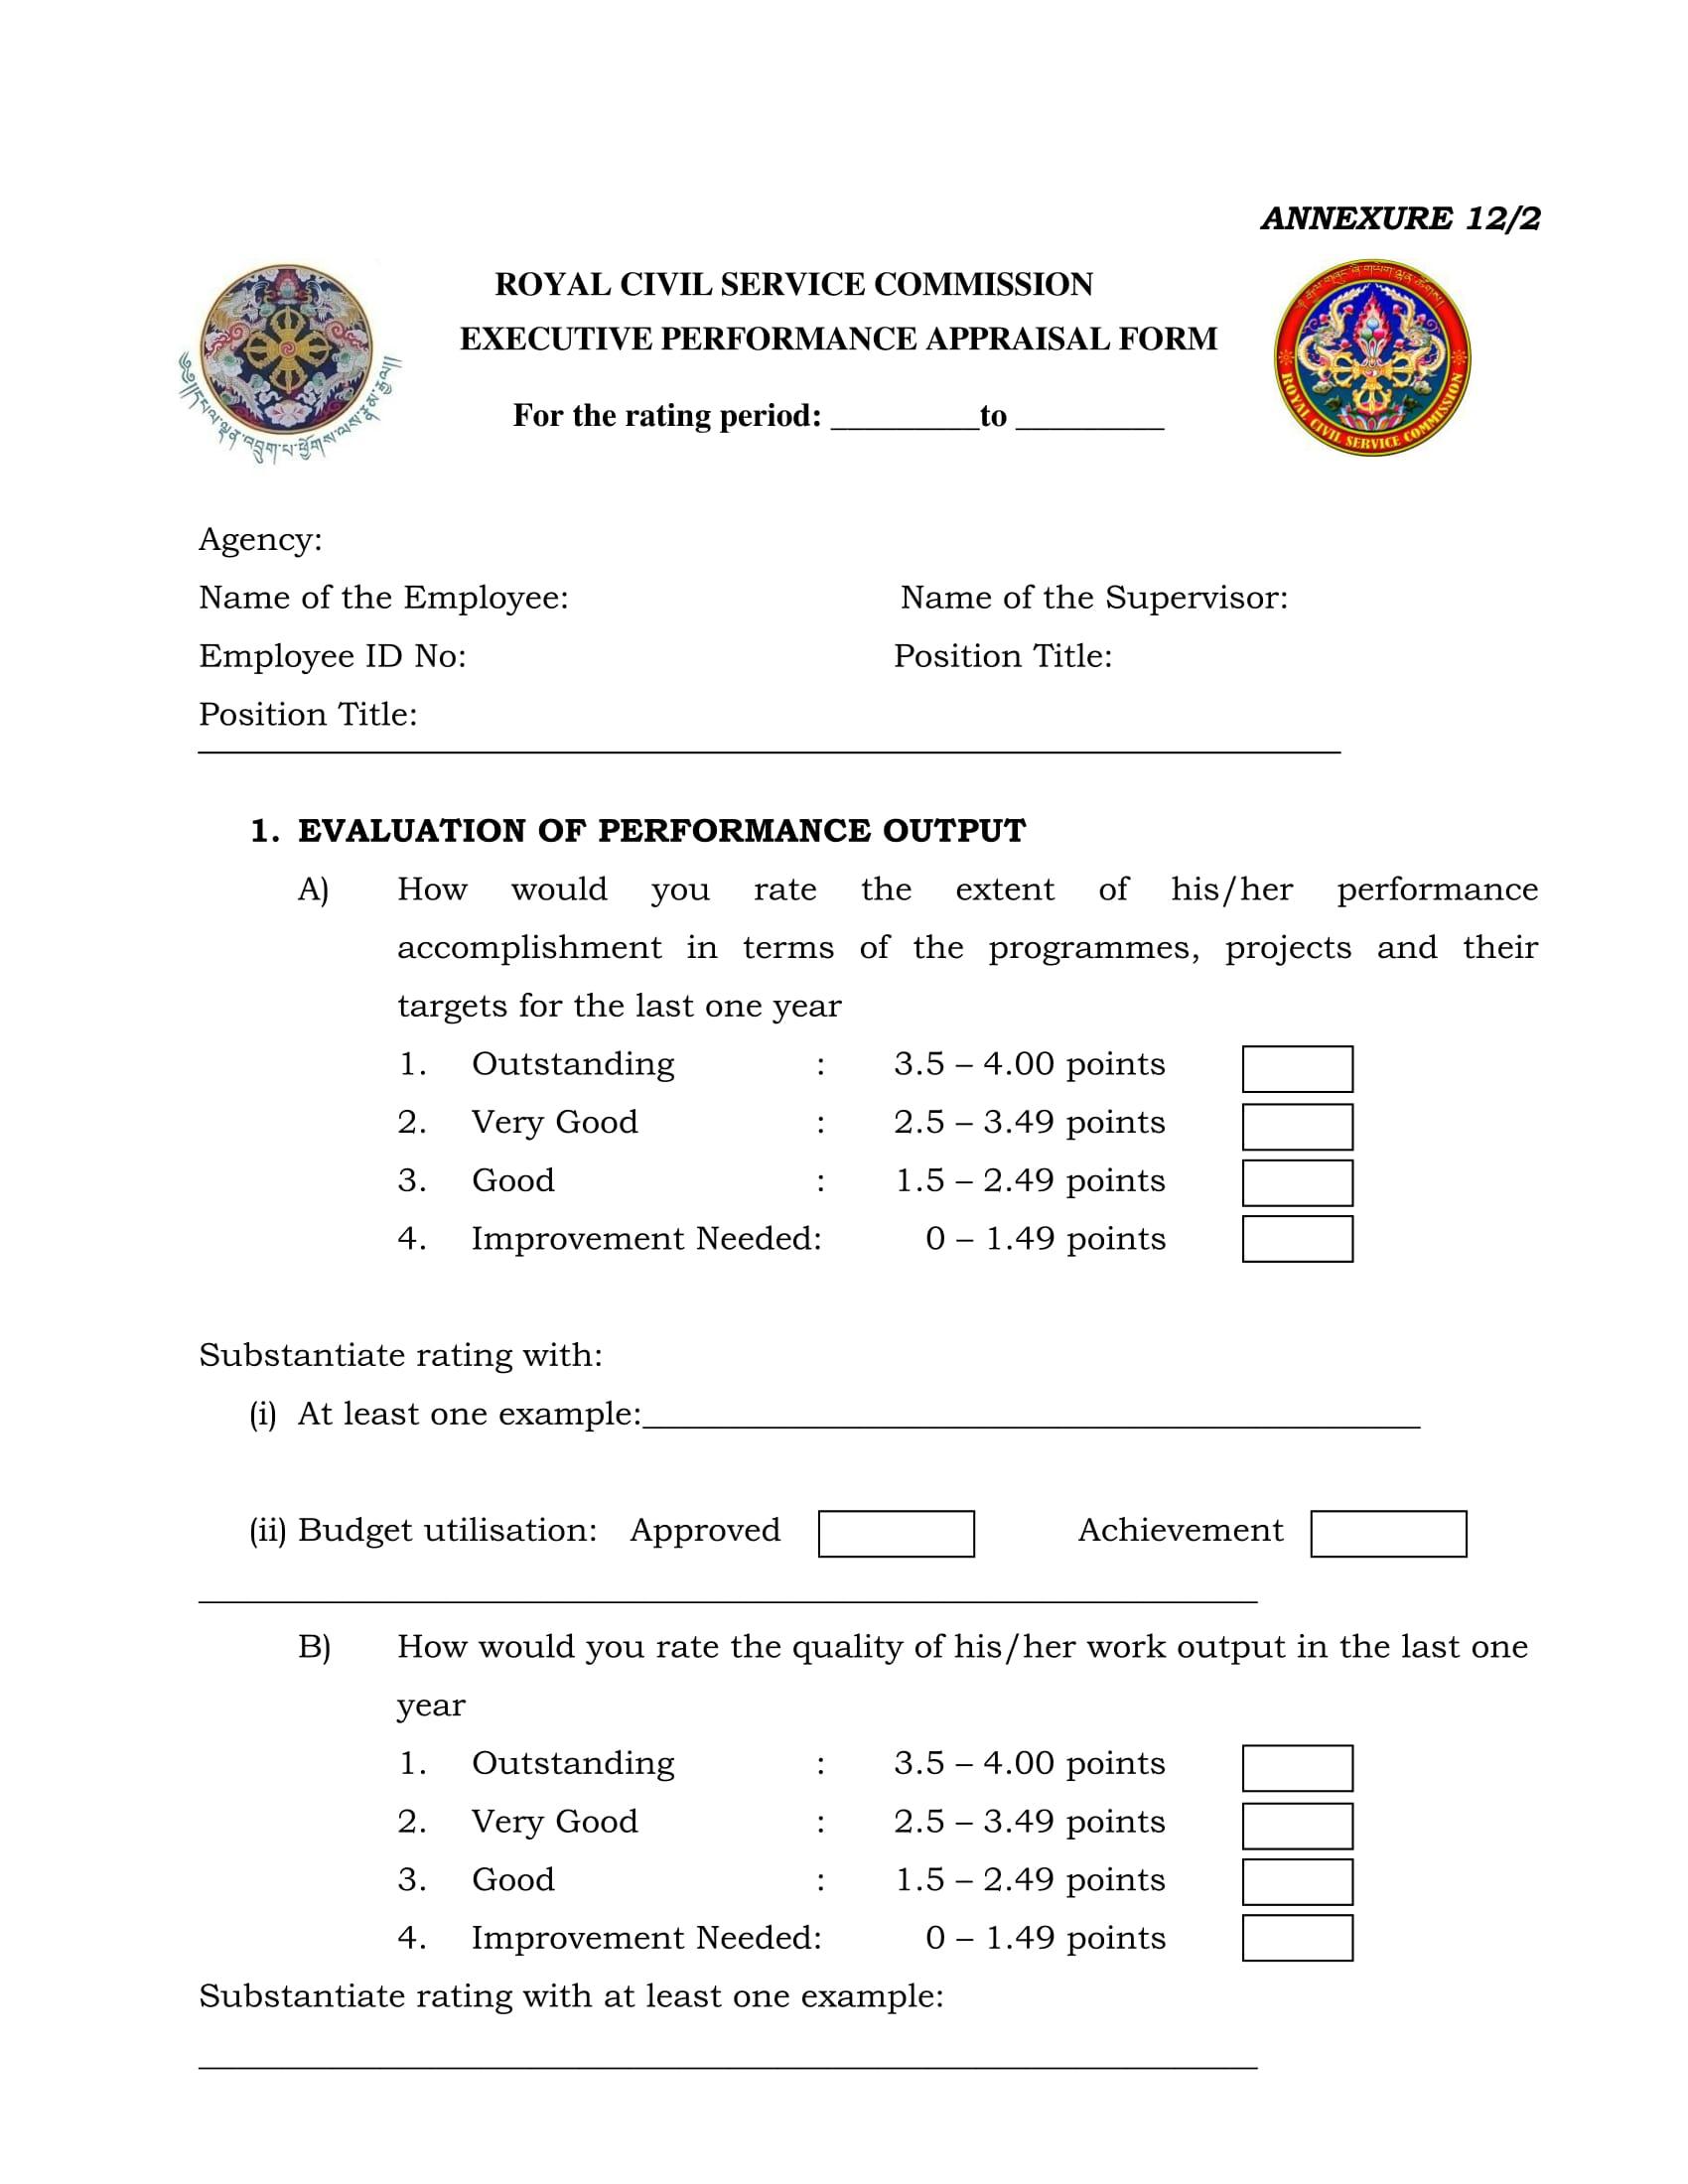 executive performance appraisal form 1